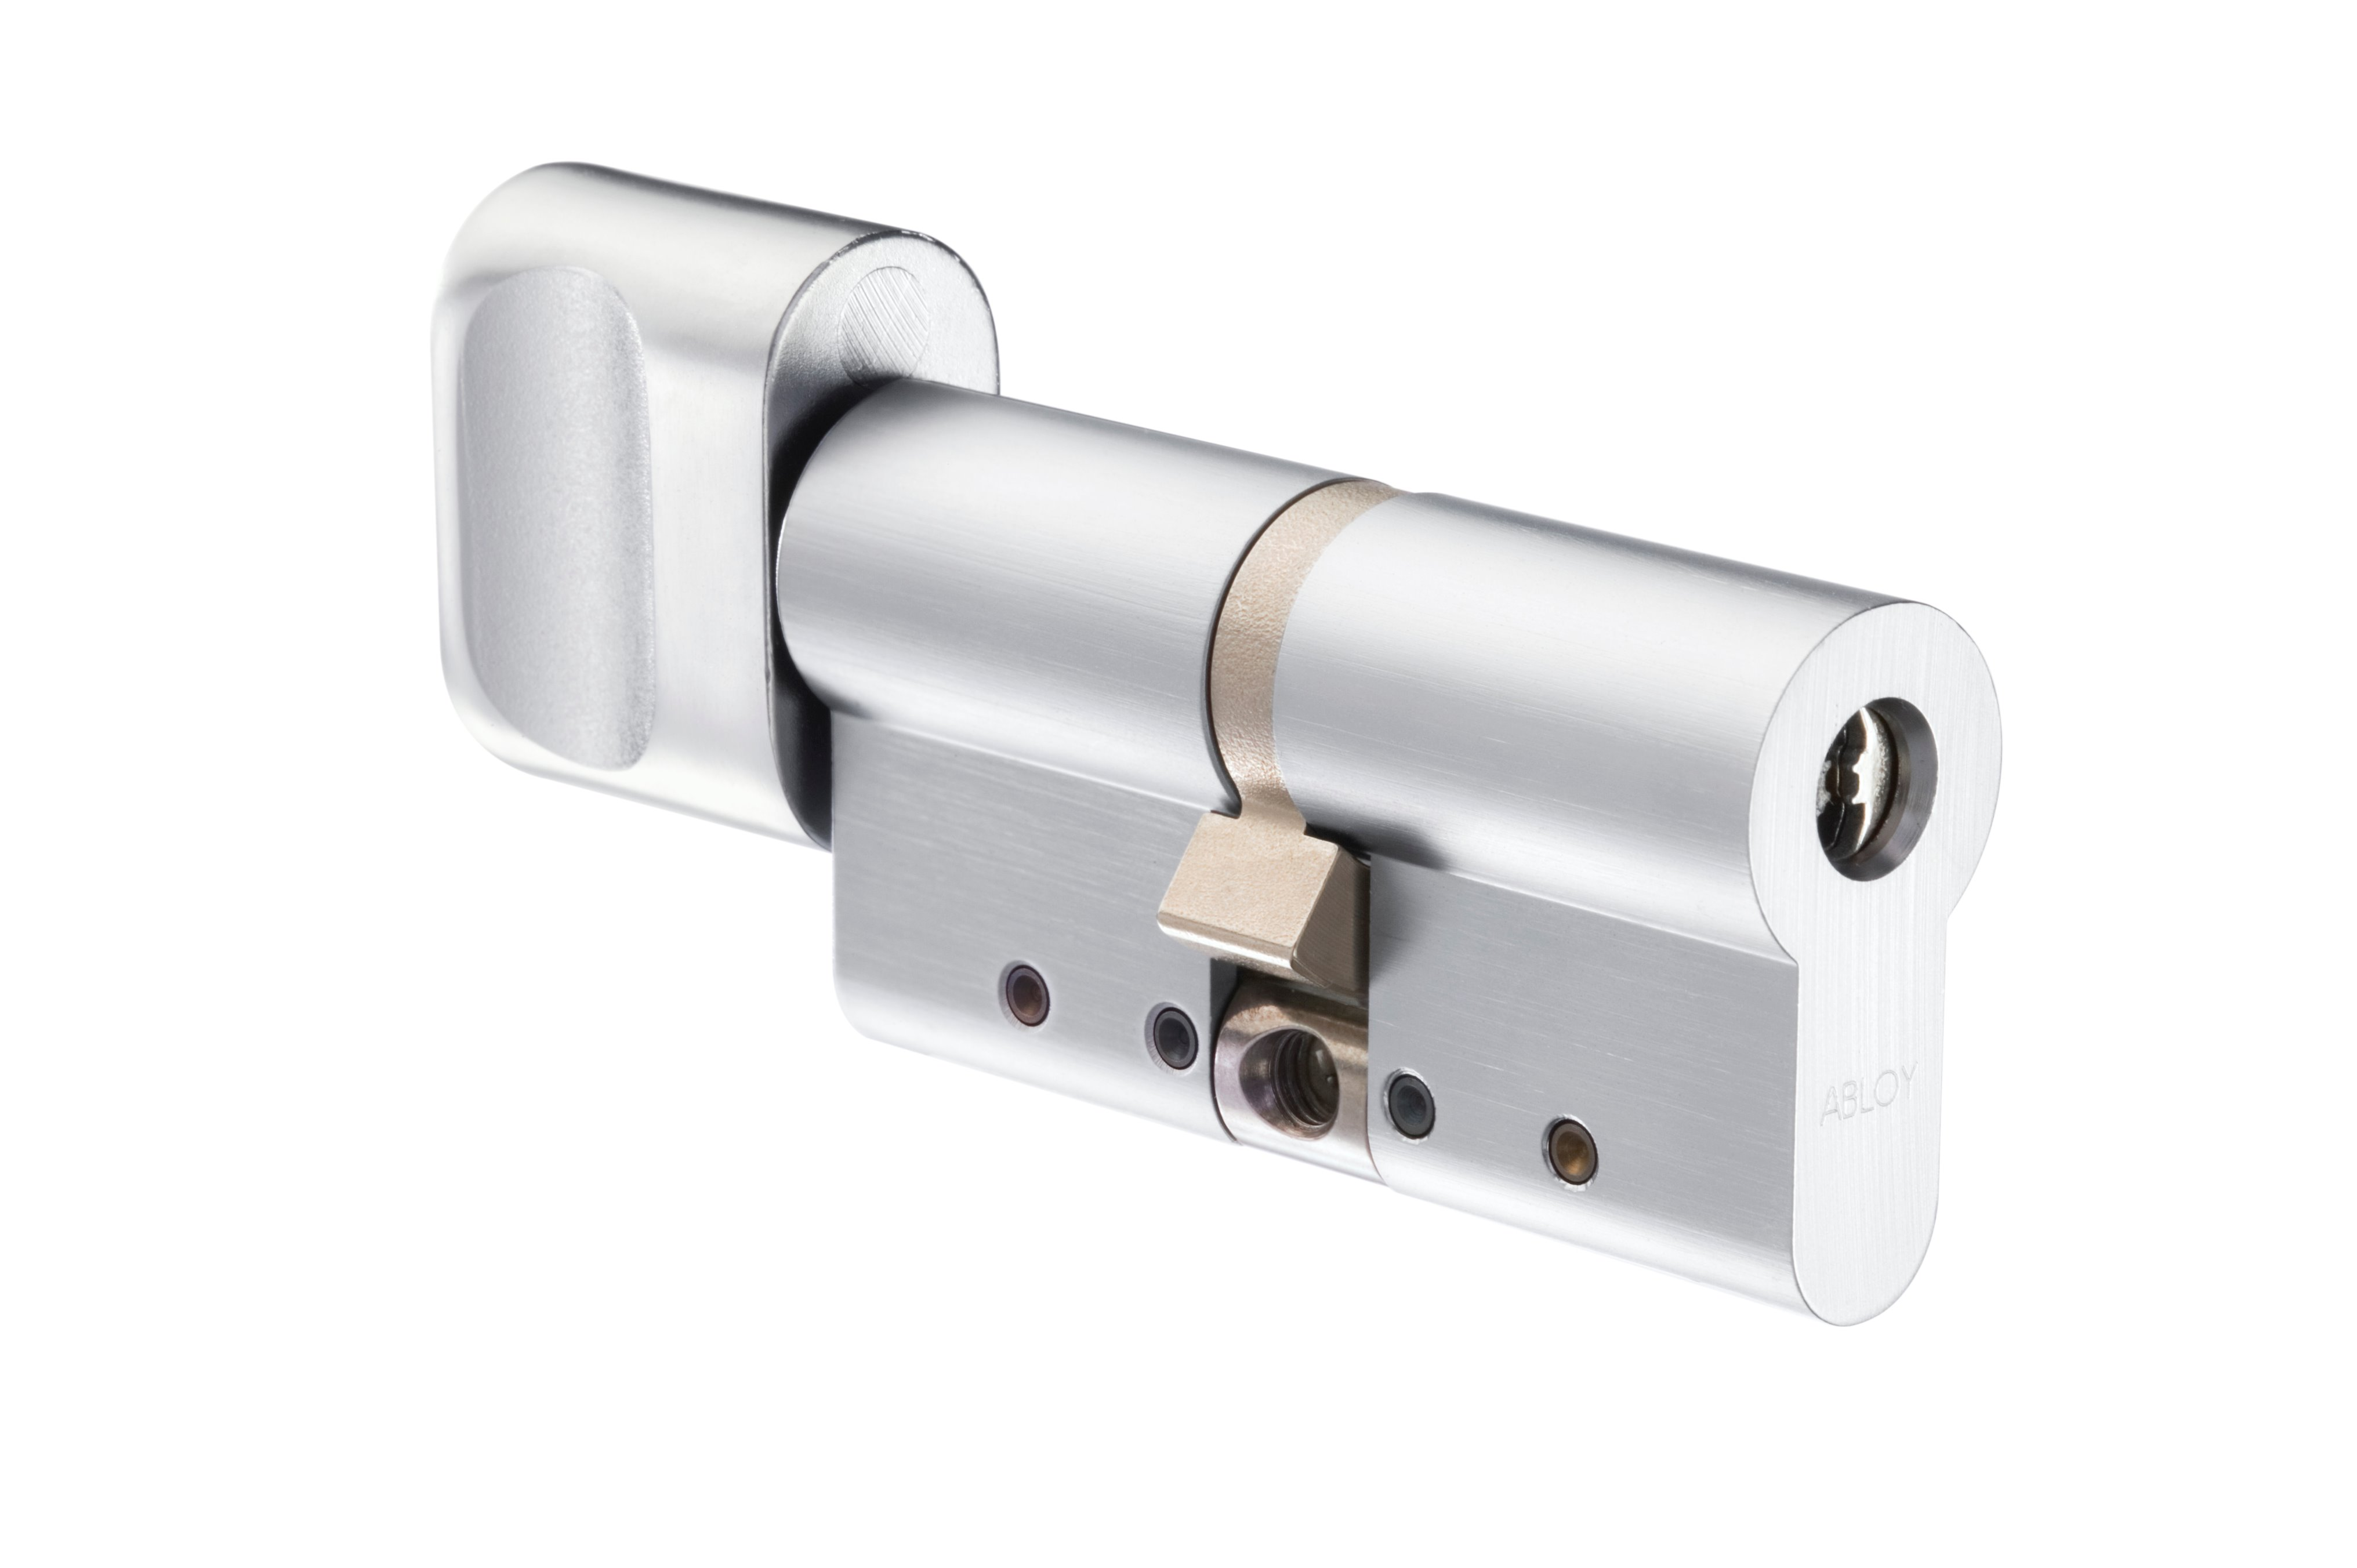 CY323 Cylinder-thumbturn